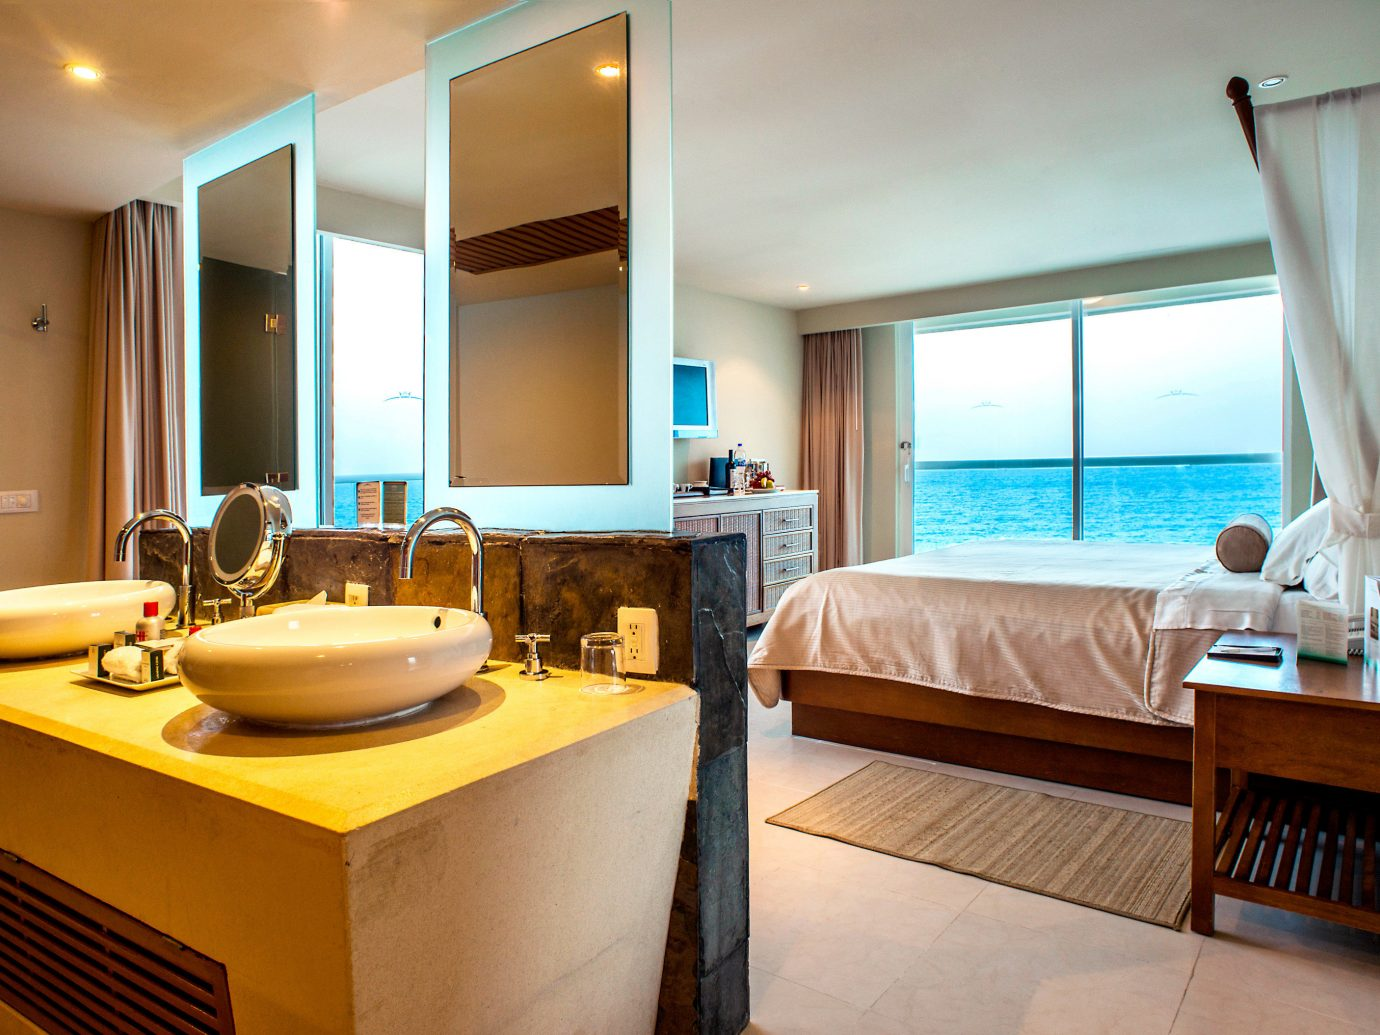 Bedroom at Sun Palace